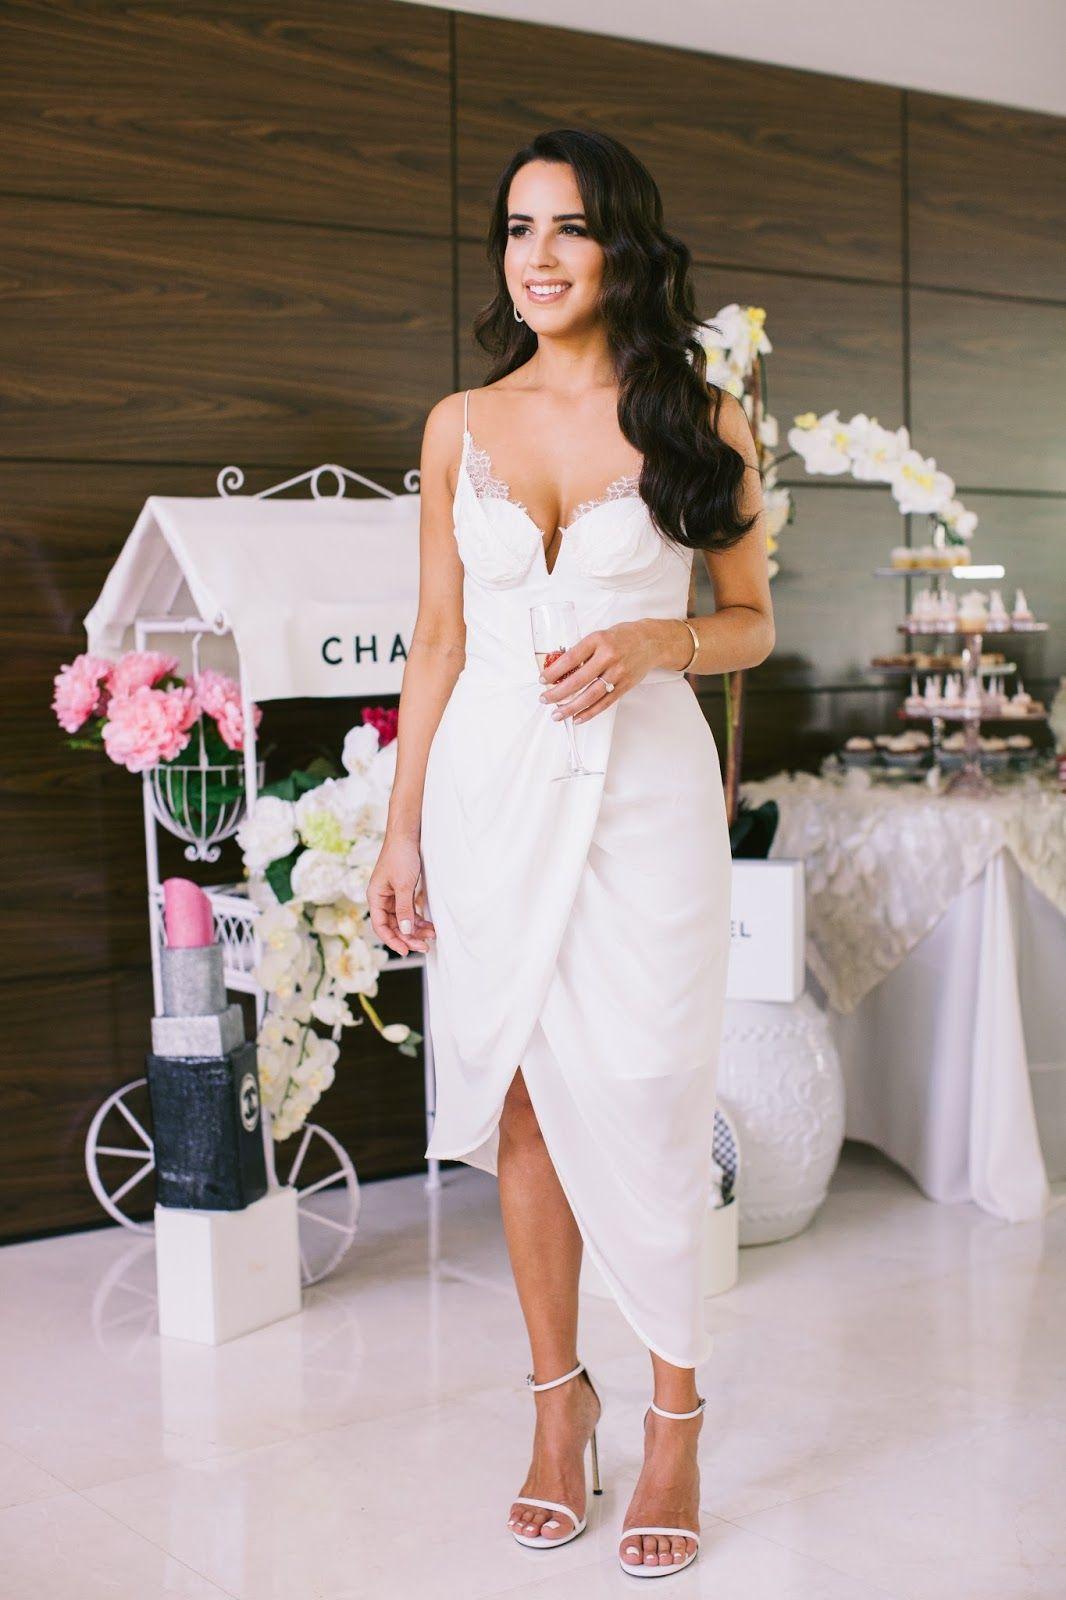 Kelly S Kloset By Kelly Saks My Tres Chic Bridal Shower White Bridal Shower Dress Bridal Shower Dress Wedding Shower Dress [ 1600 x 1066 Pixel ]